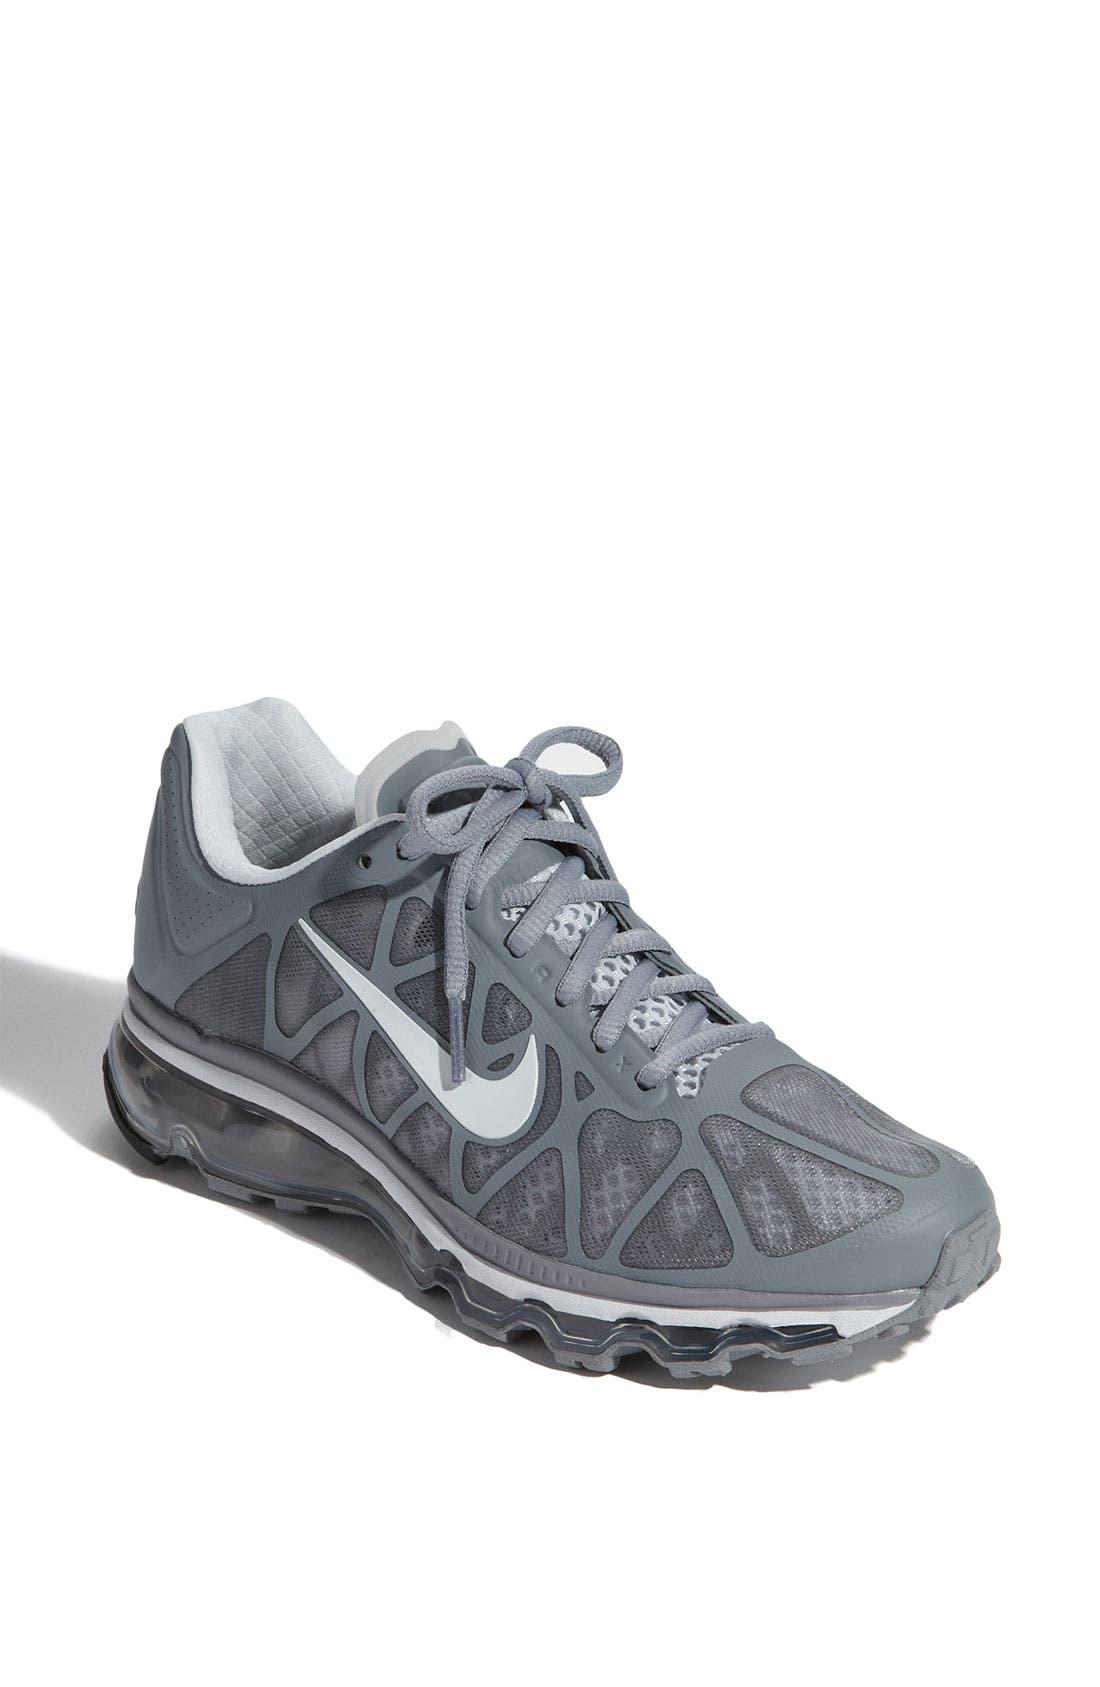 Alternate Image 1 Selected - Nike 'Air Max+ 2011' Running Shoe (Women)